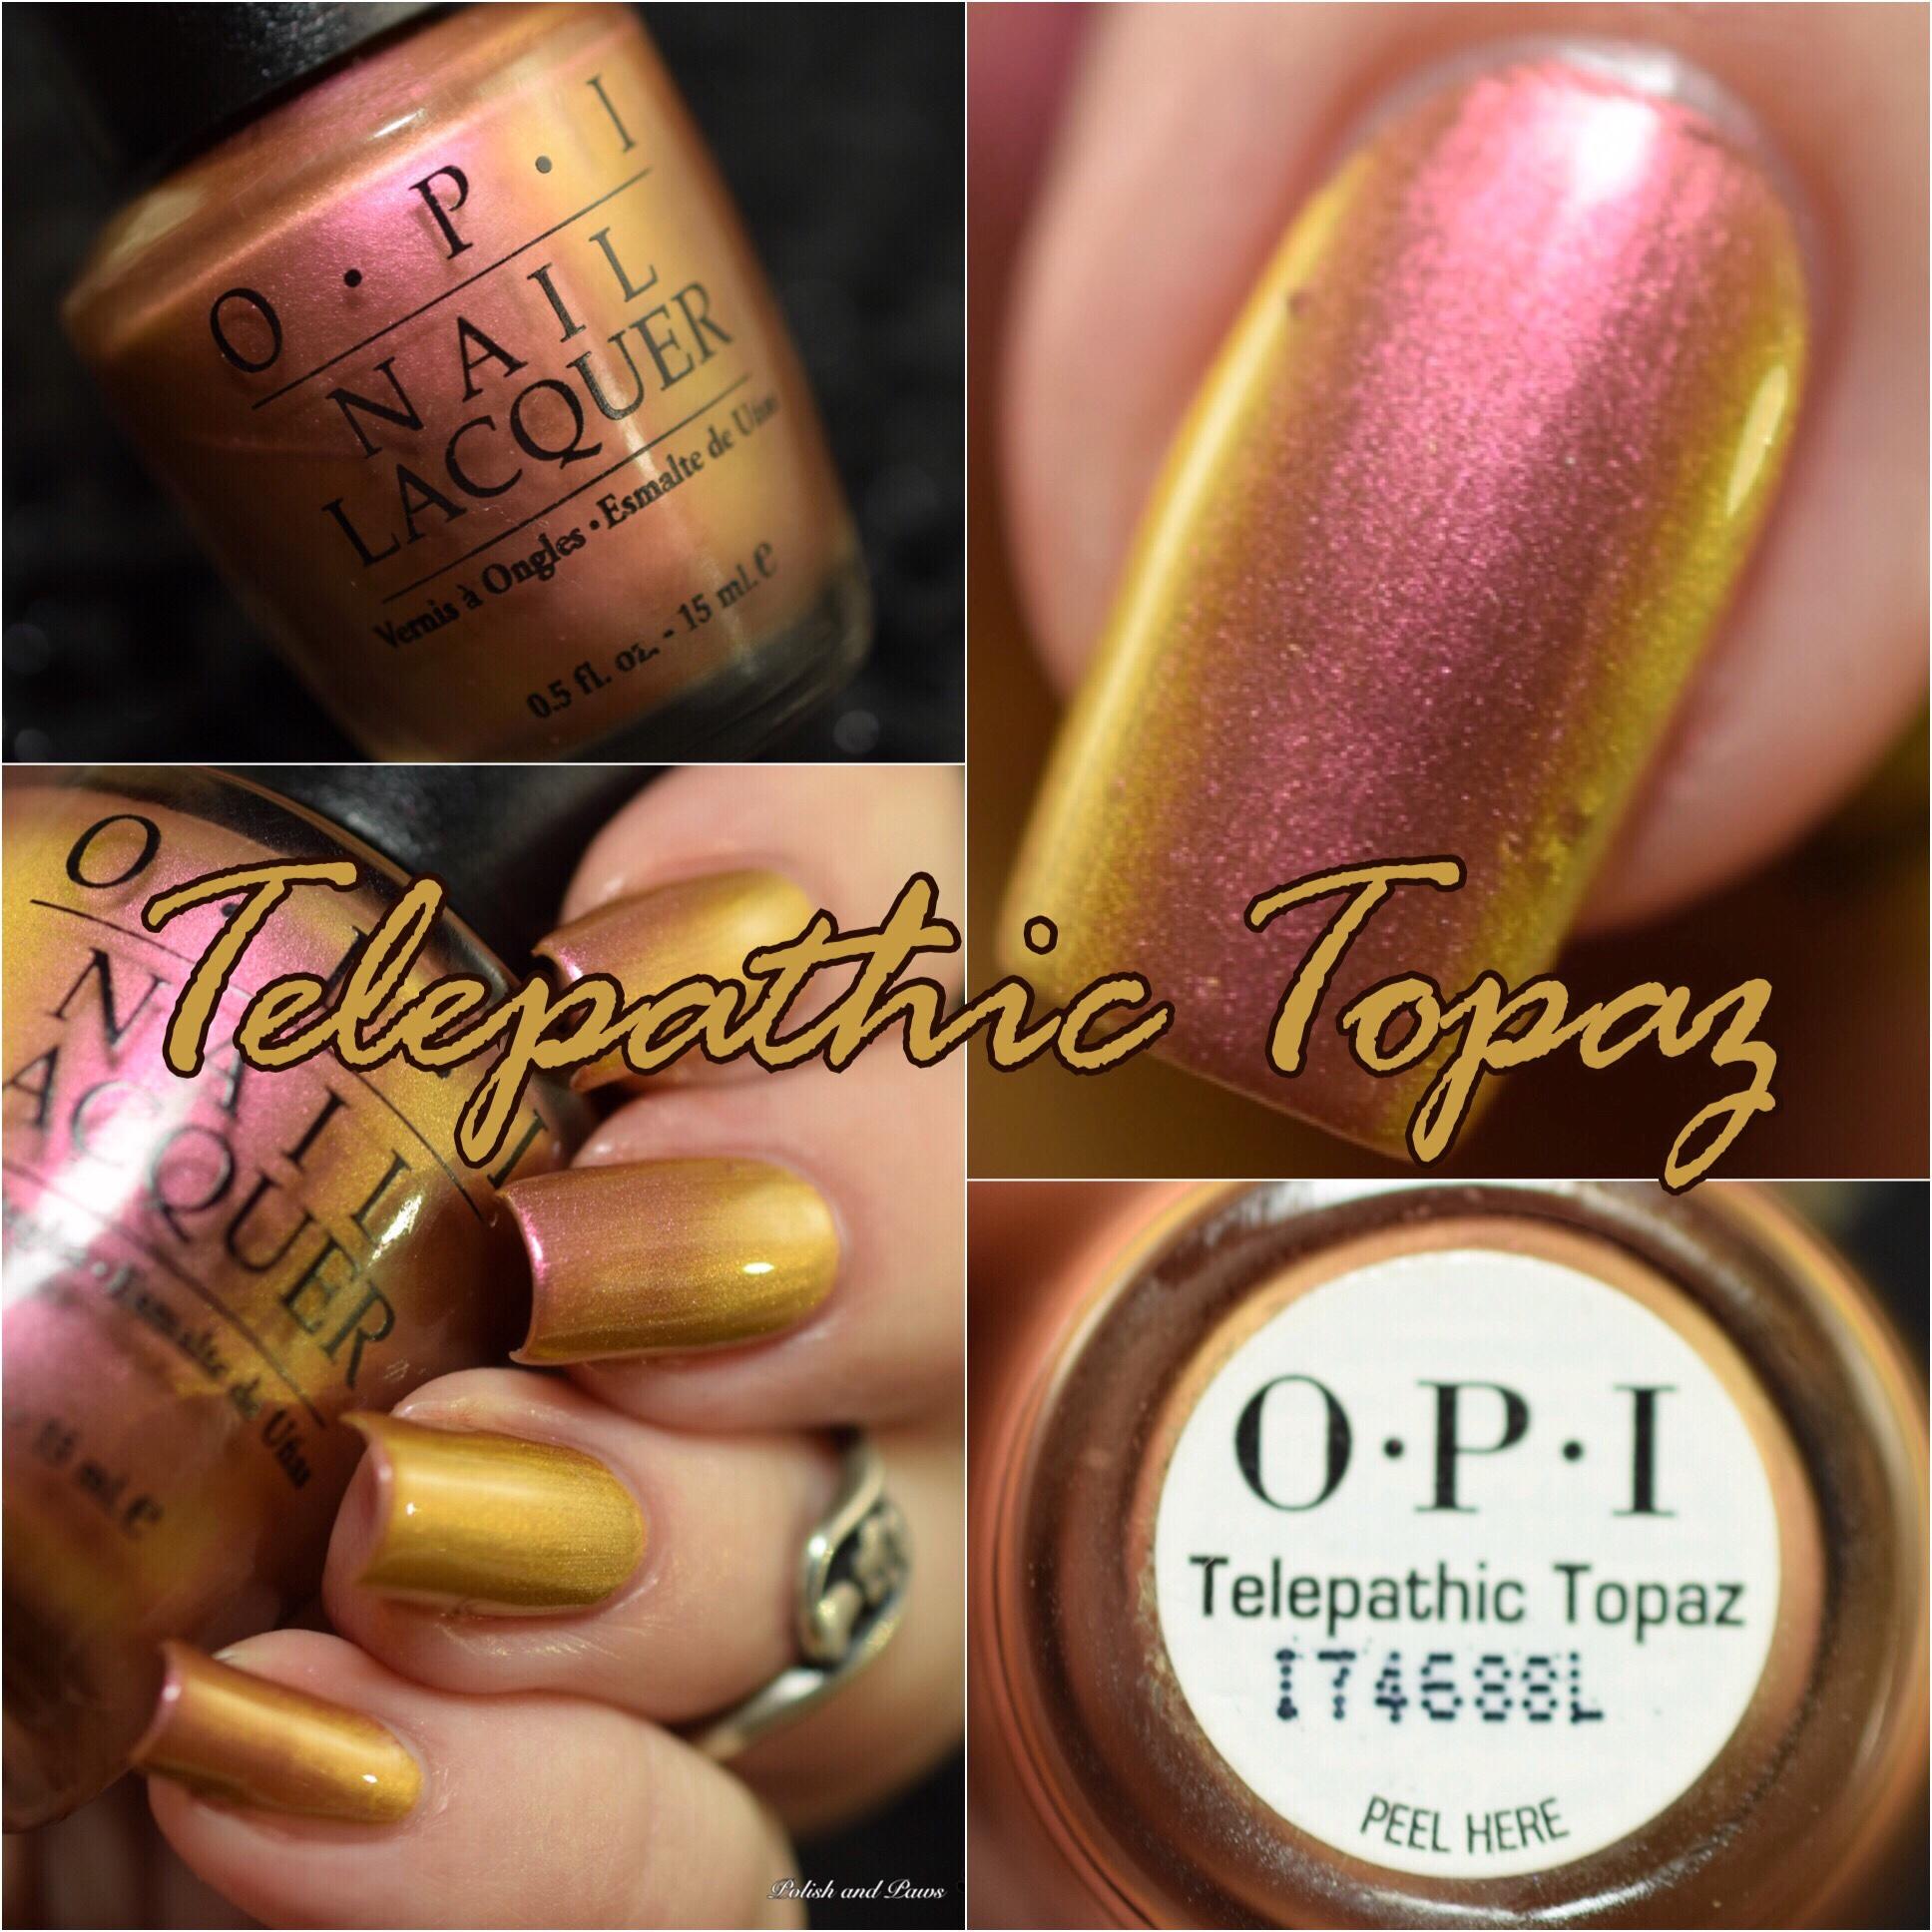 OPI Telepathic Topaz